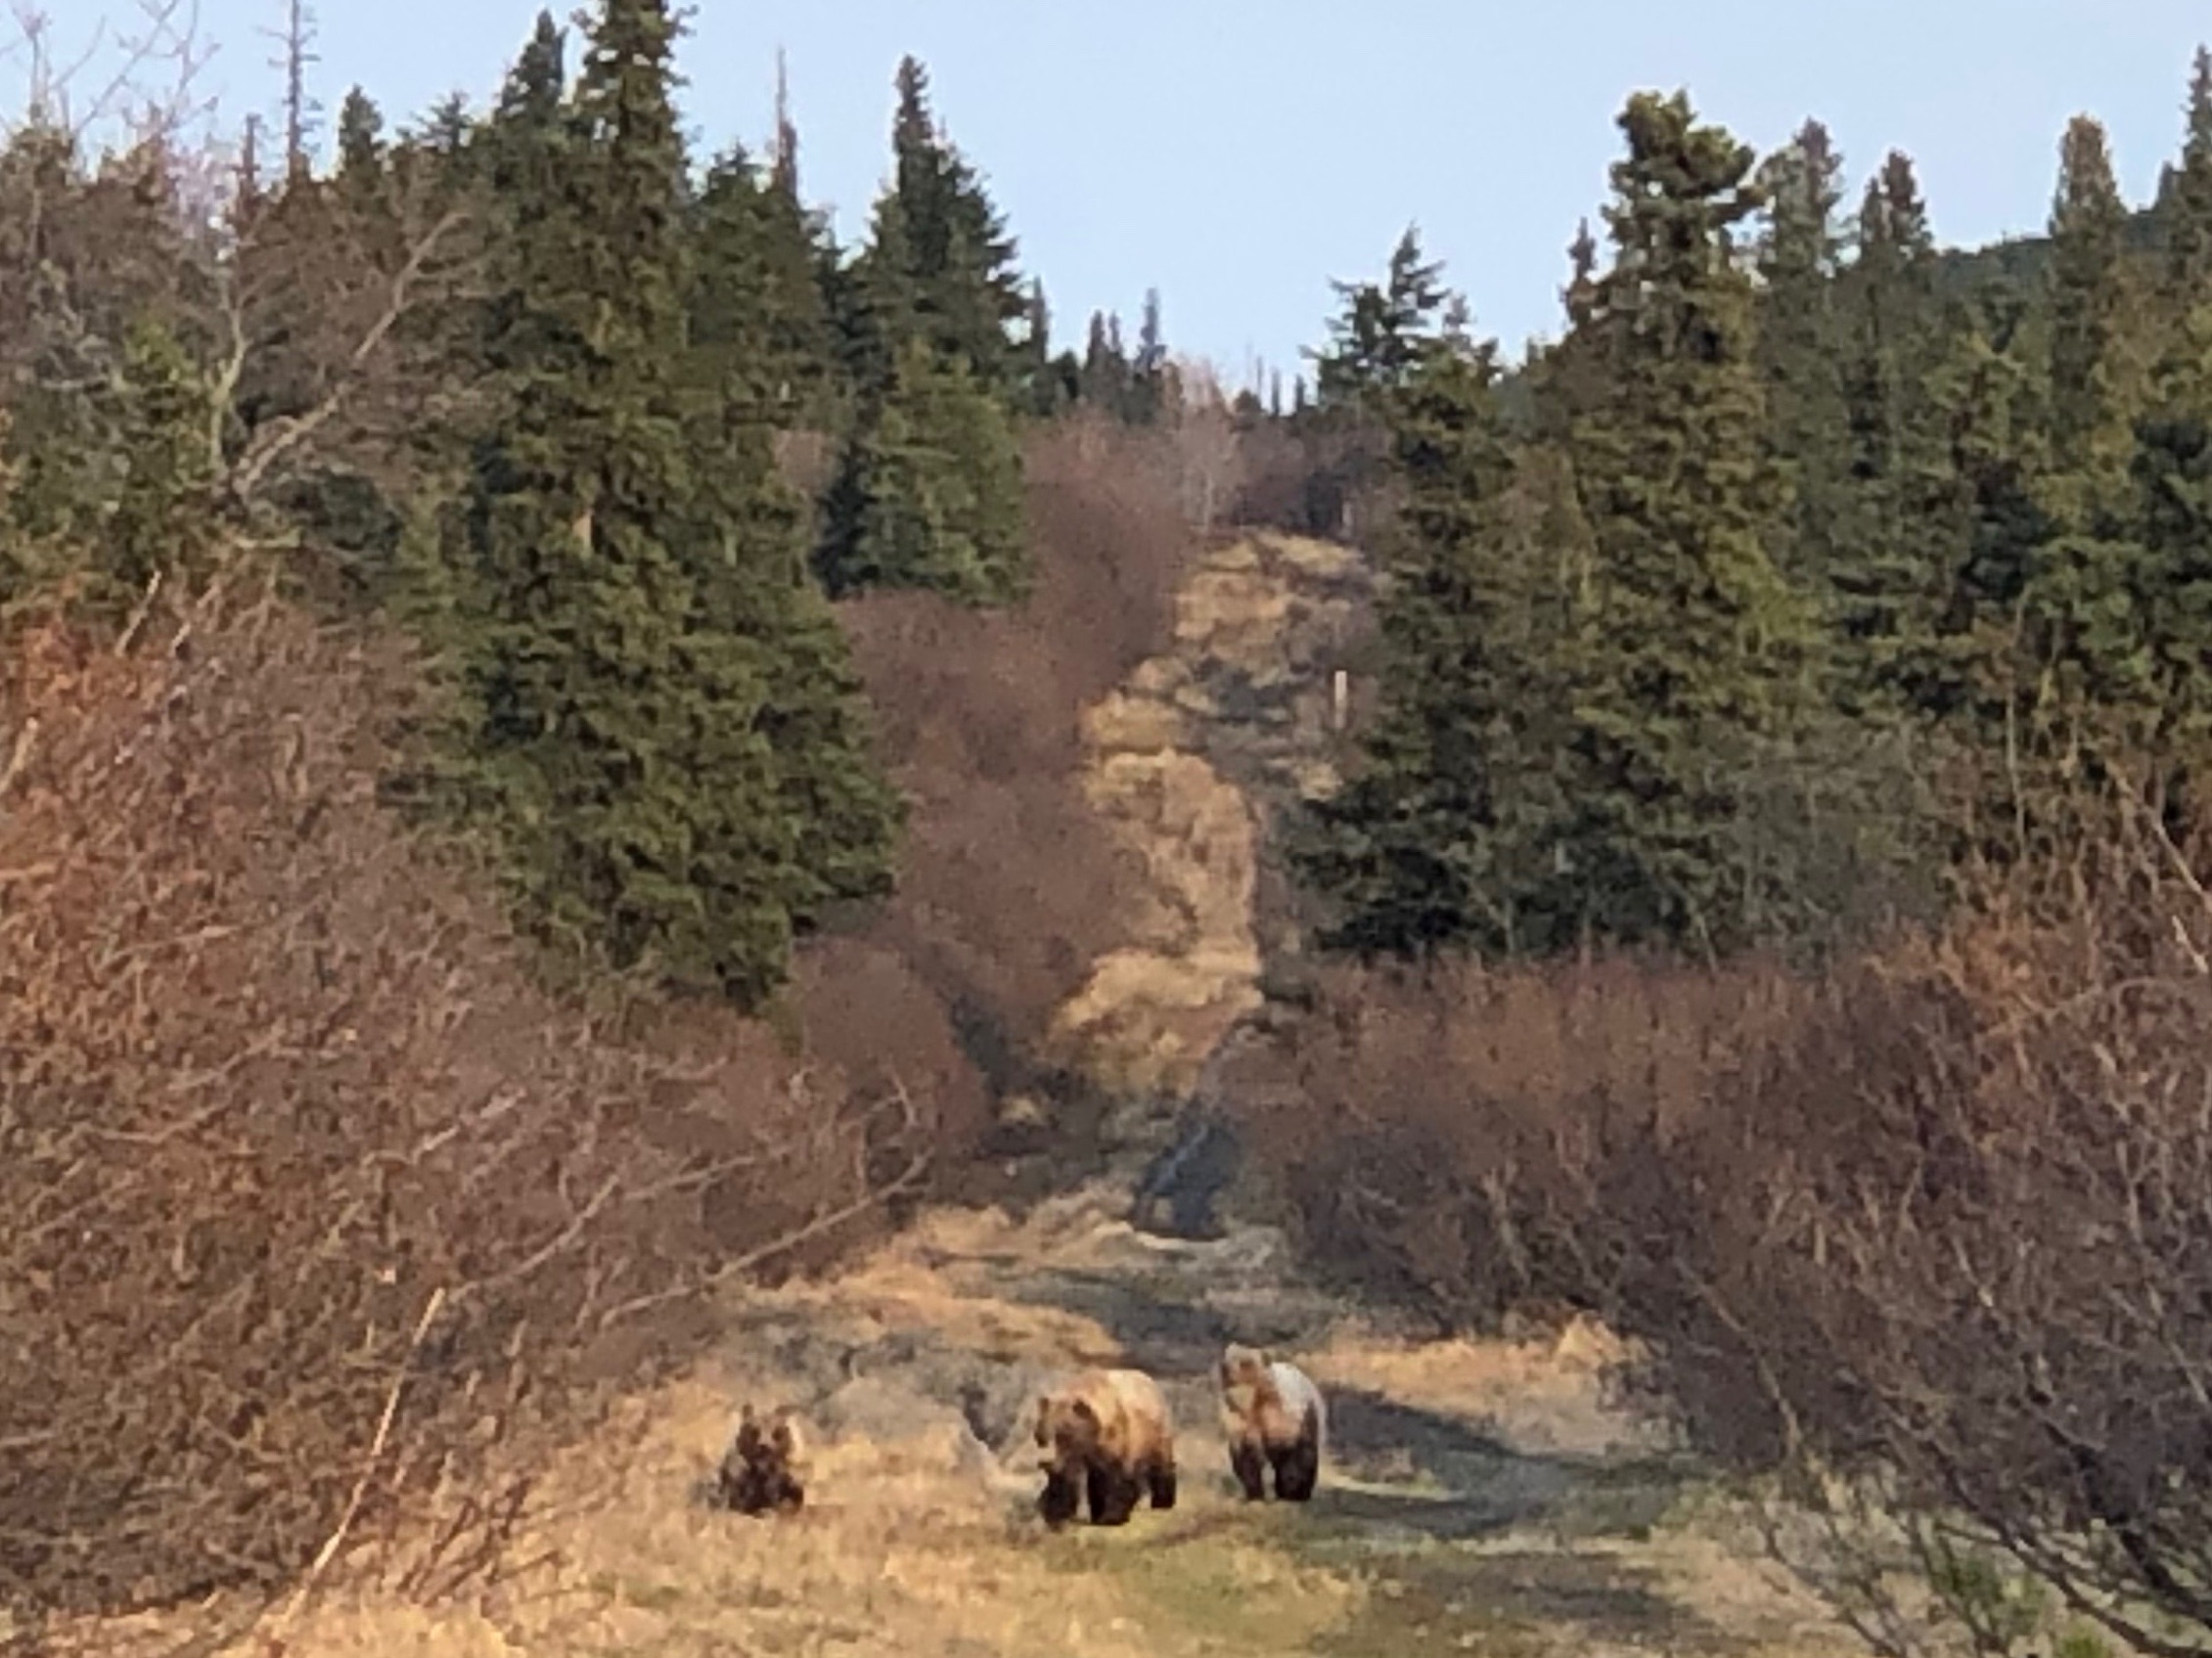 Bears on Gasline – May 13th, 2019